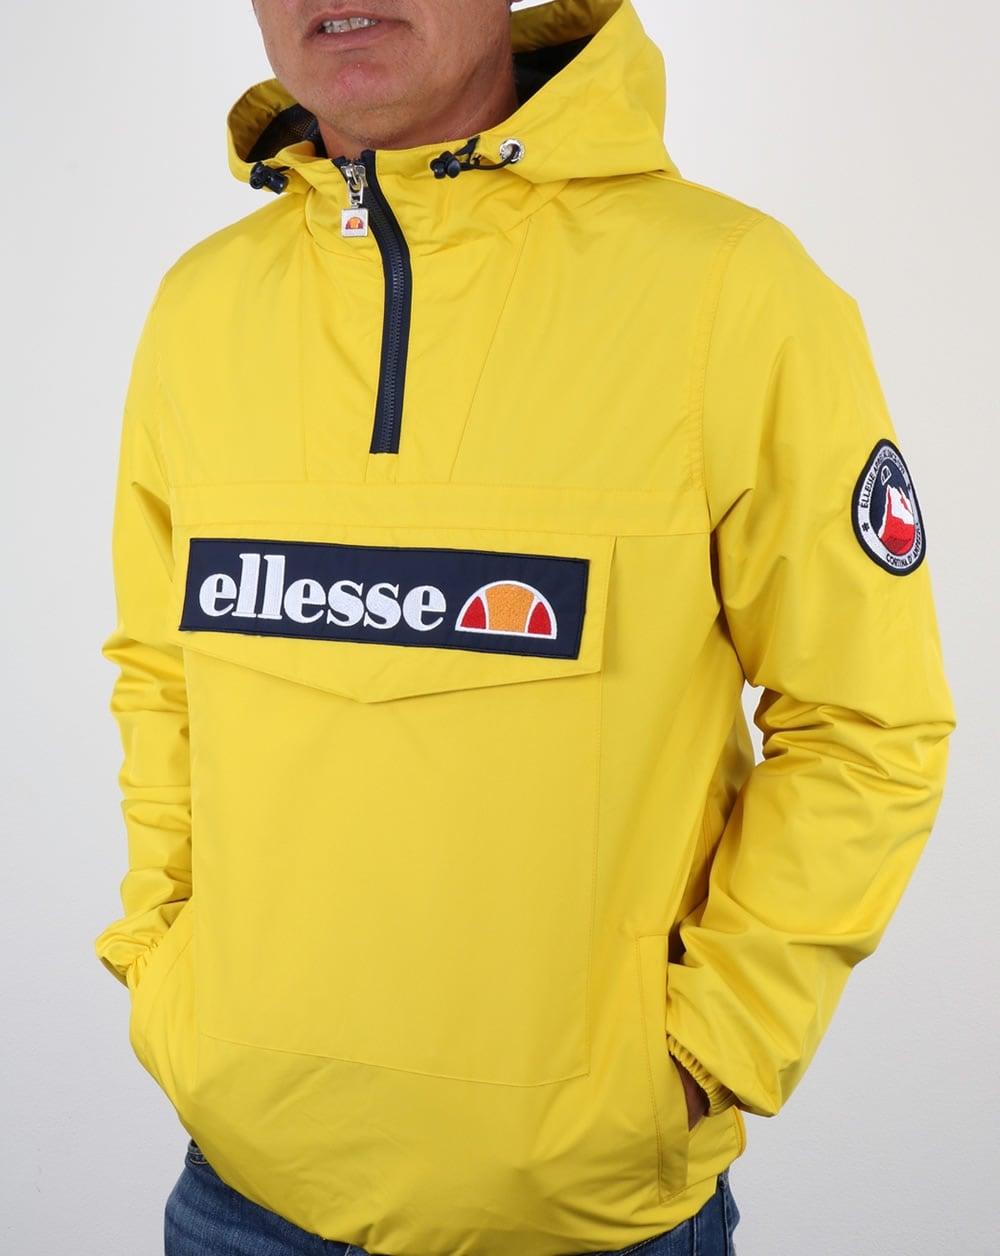 Overhead Xxqdr8 Ii Ellesse Coat Yellow Mont Smock Mens Jacket 0fOCqaH